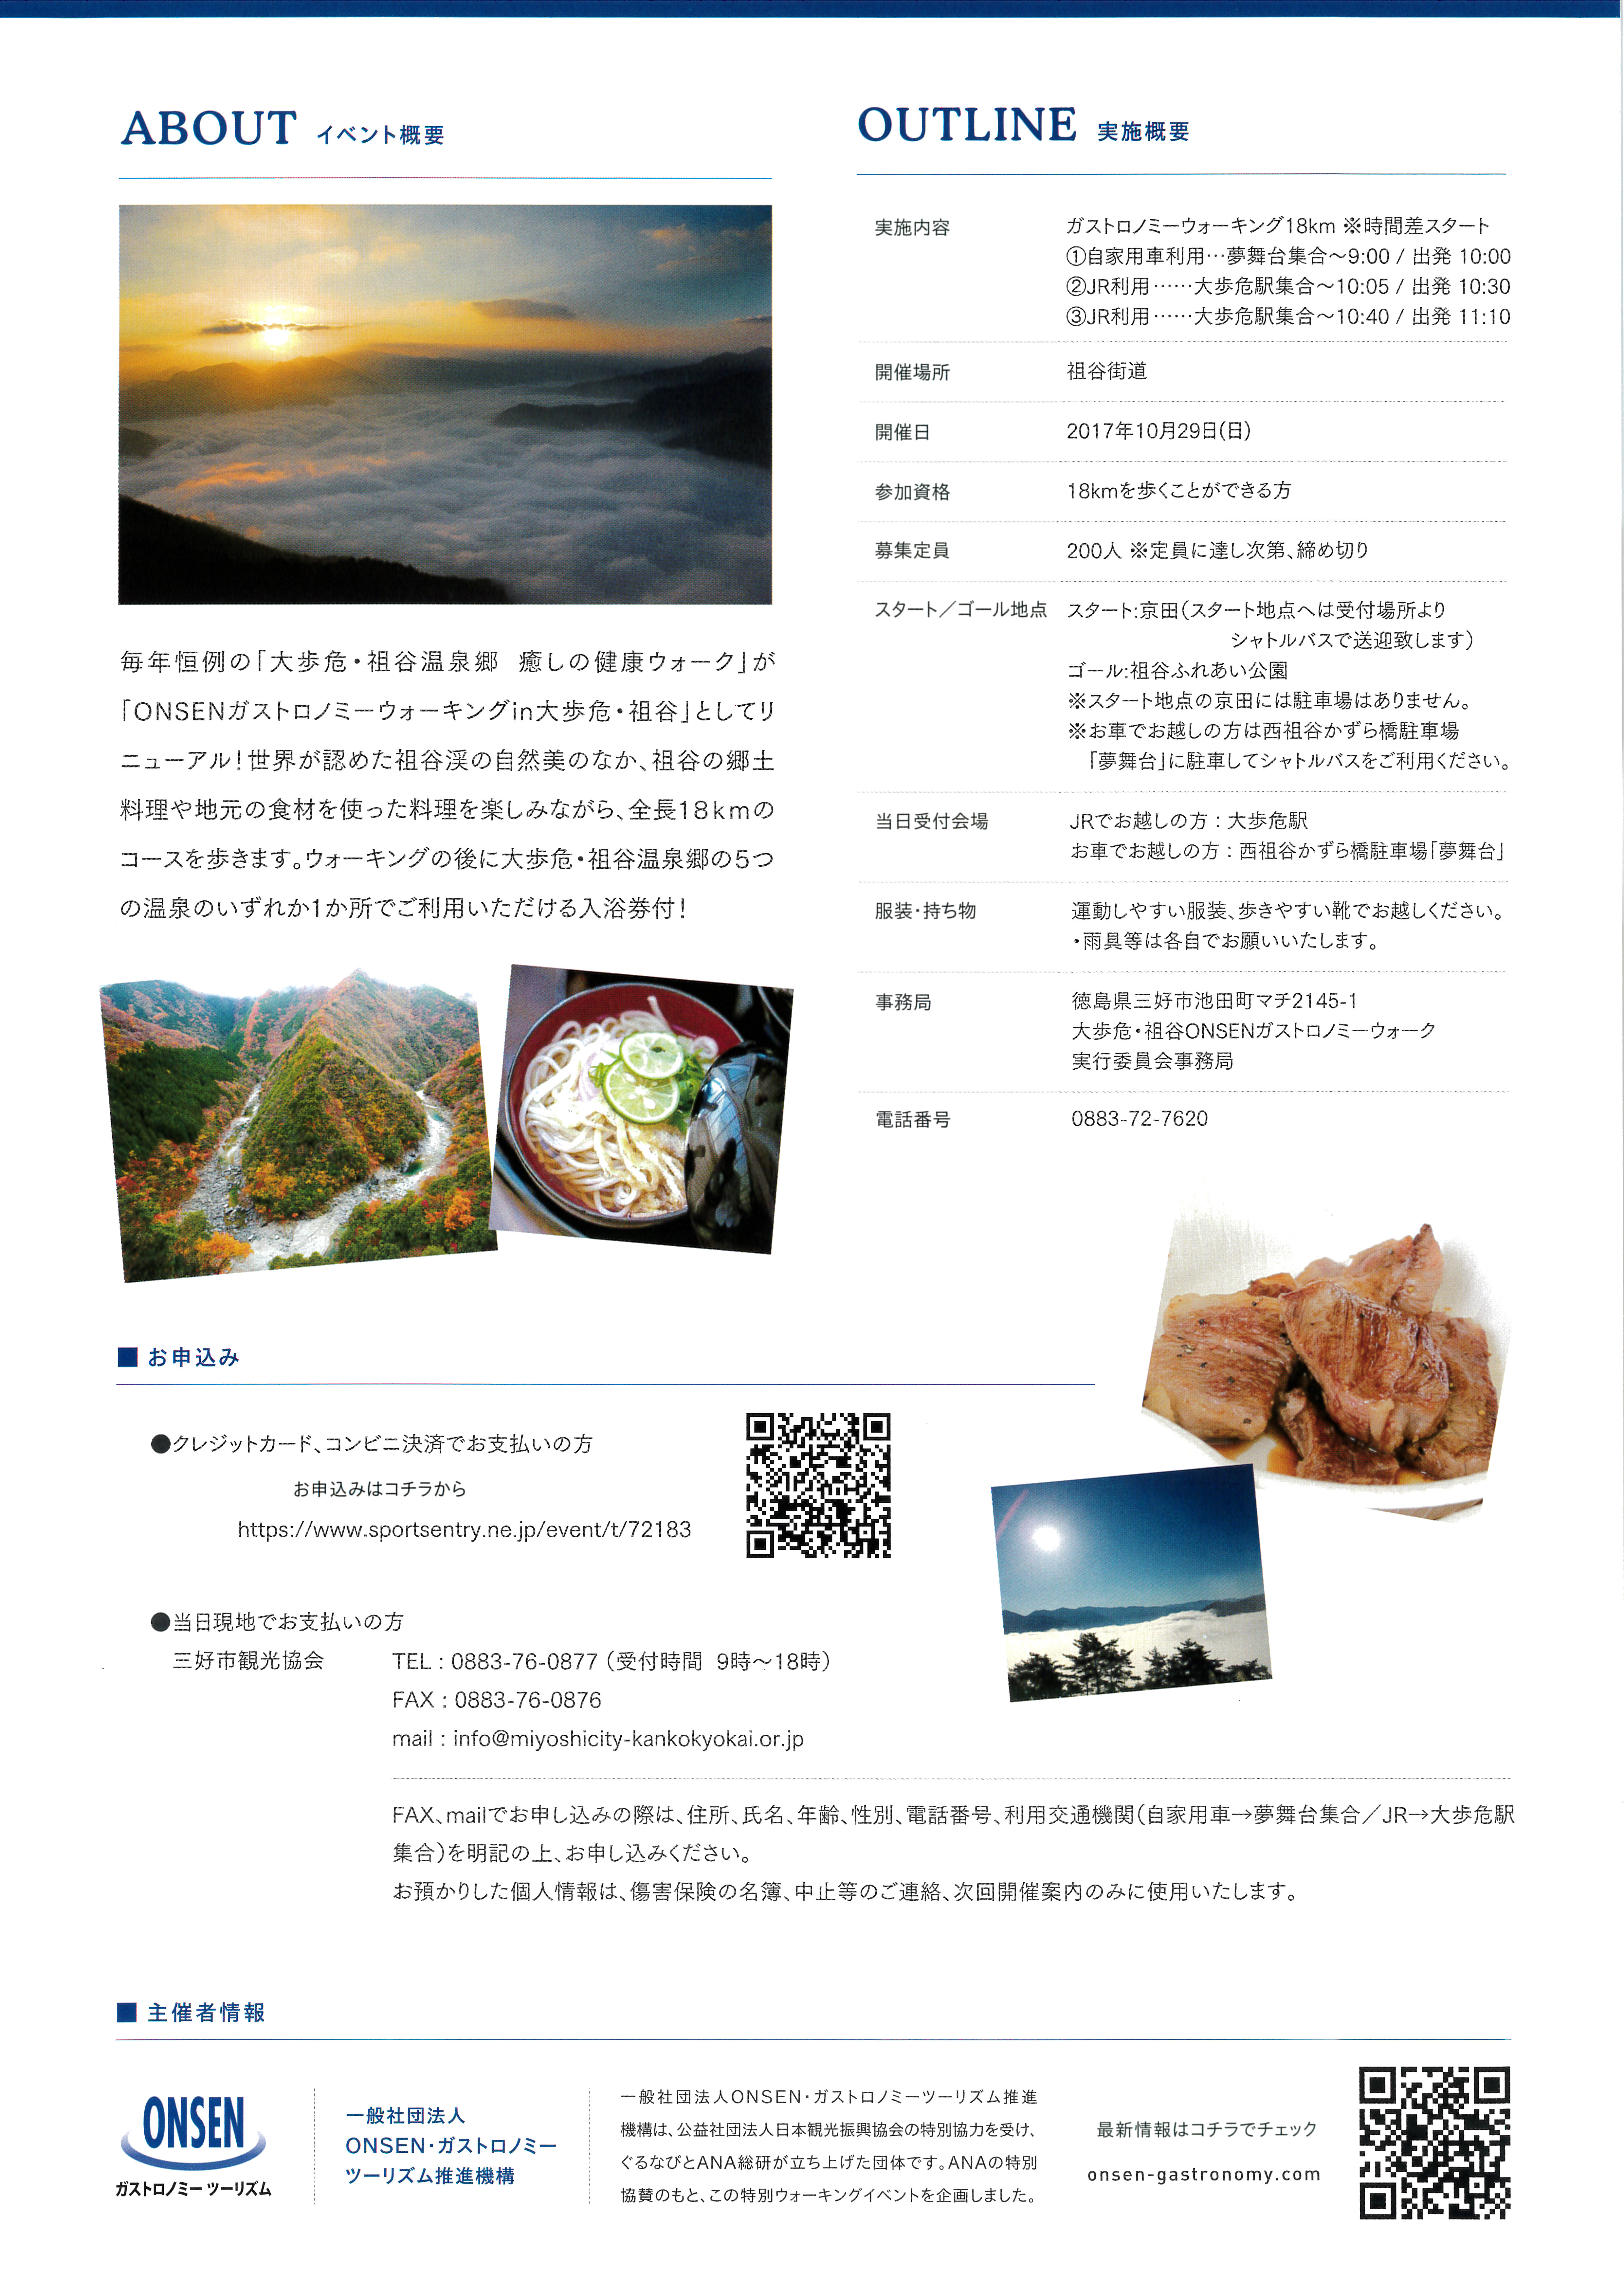 https://www.oboke-iya.jp/whatsnew/MX-3150FN_20171004_104353_0001.jpg